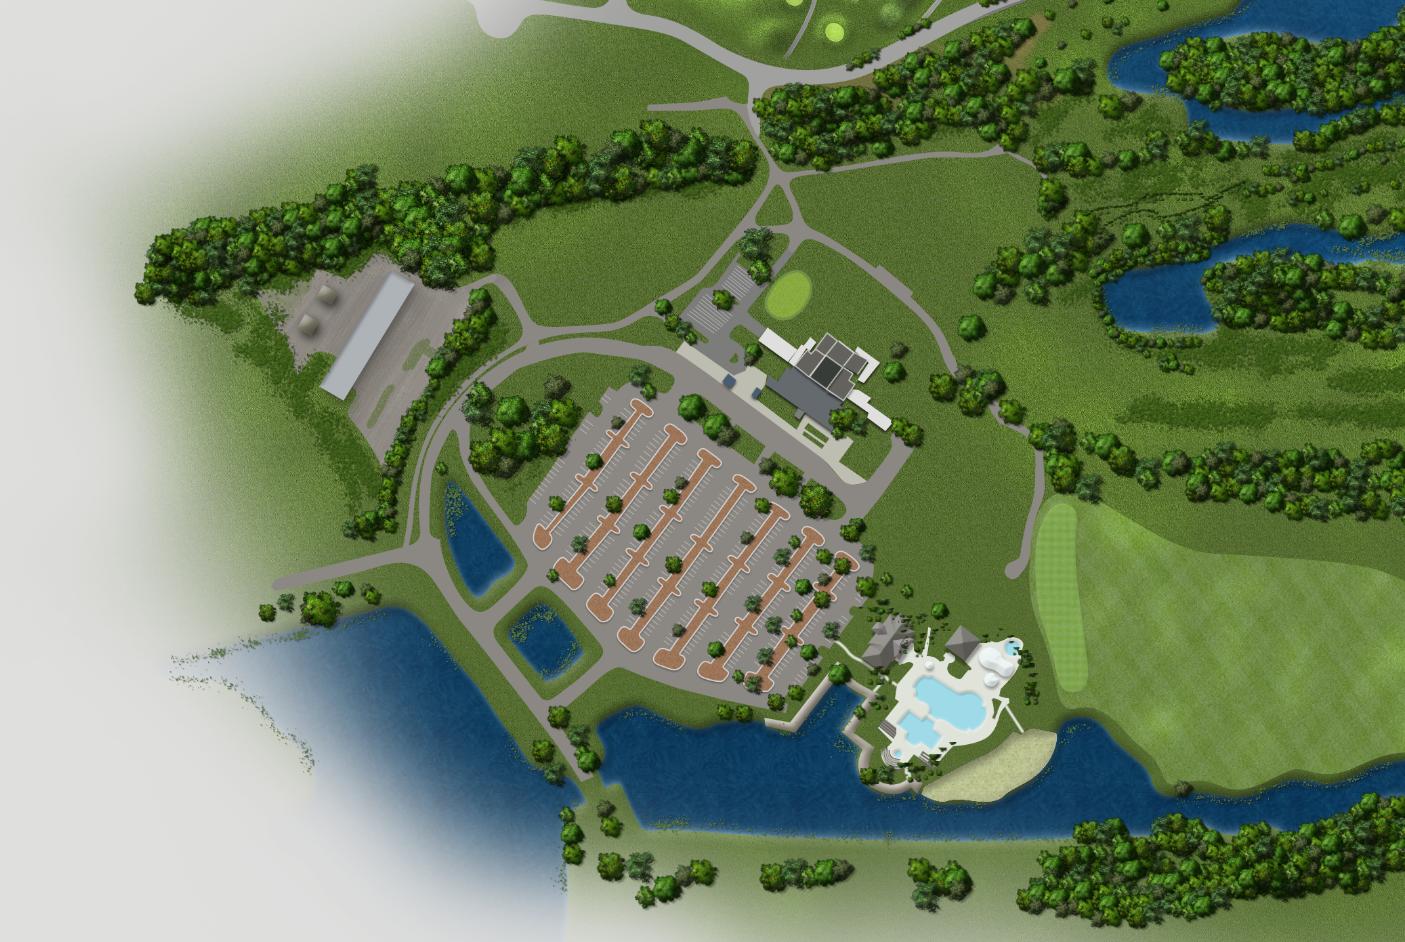 Golf Courses In South Carolina Map.Portfolio From The Graphic Artist Illustrator Darren Robinson Golf